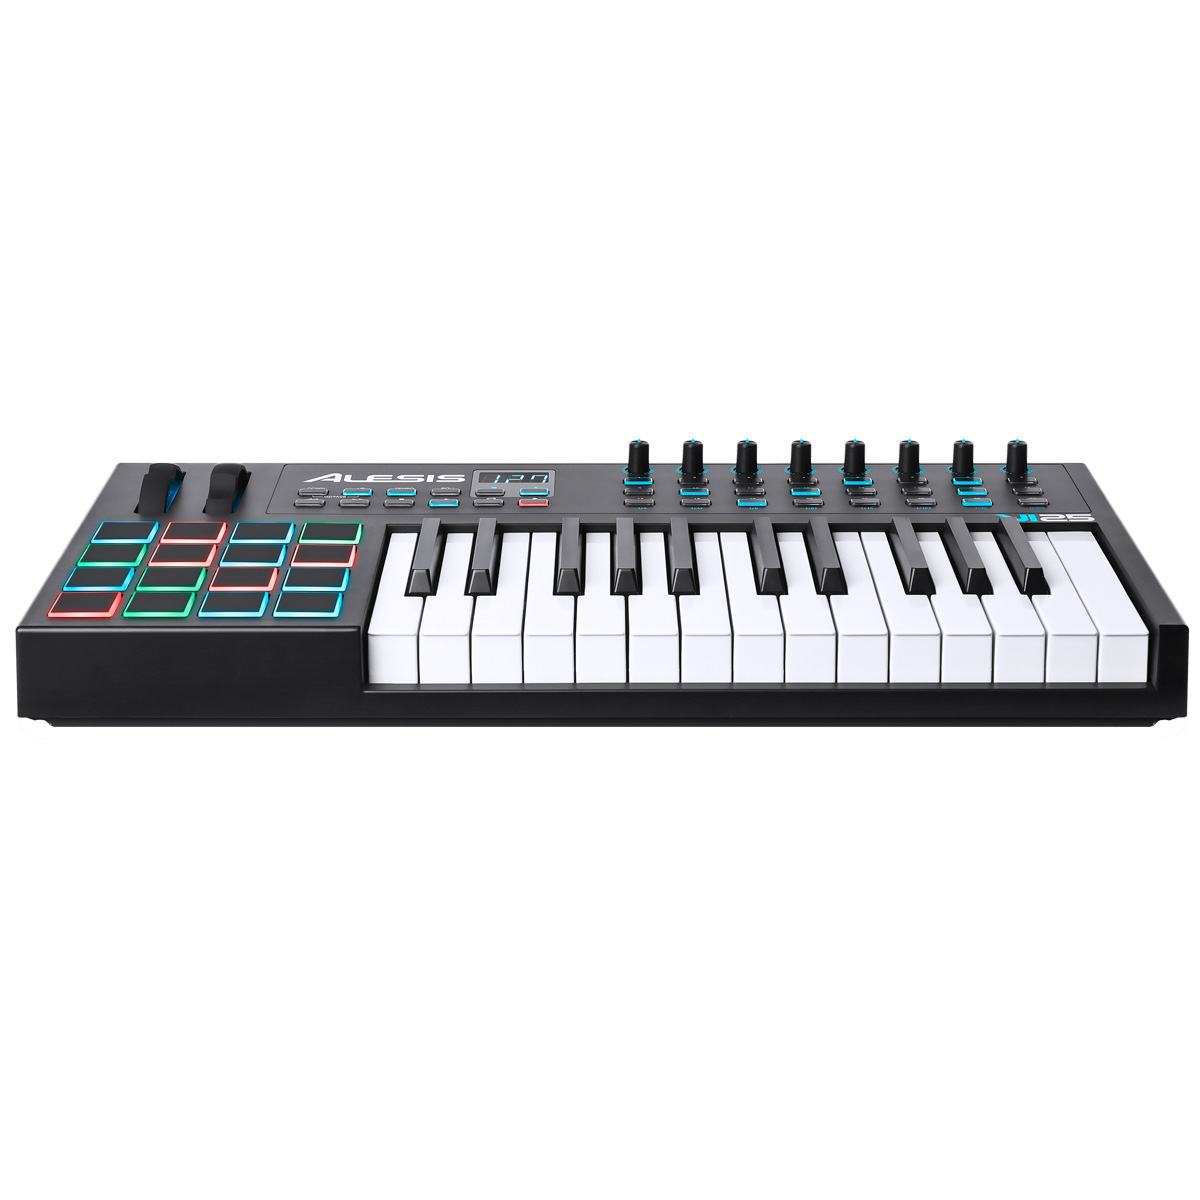 VI25 - Teclado Controlador MIDI / USB VI 25 - Alesis